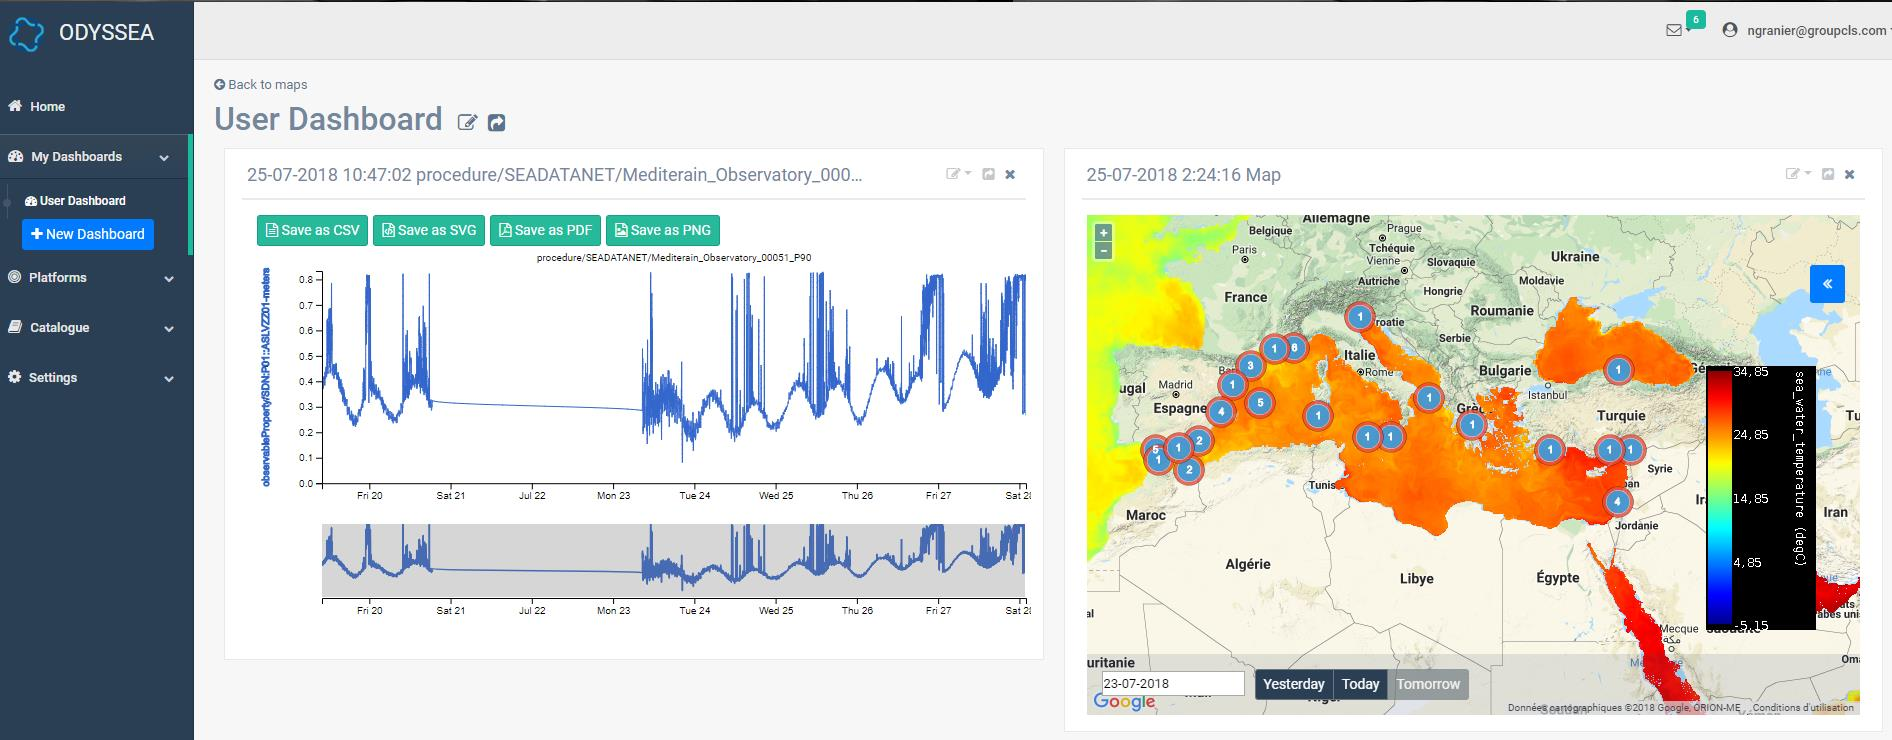 user dashboard odyssea metocean data